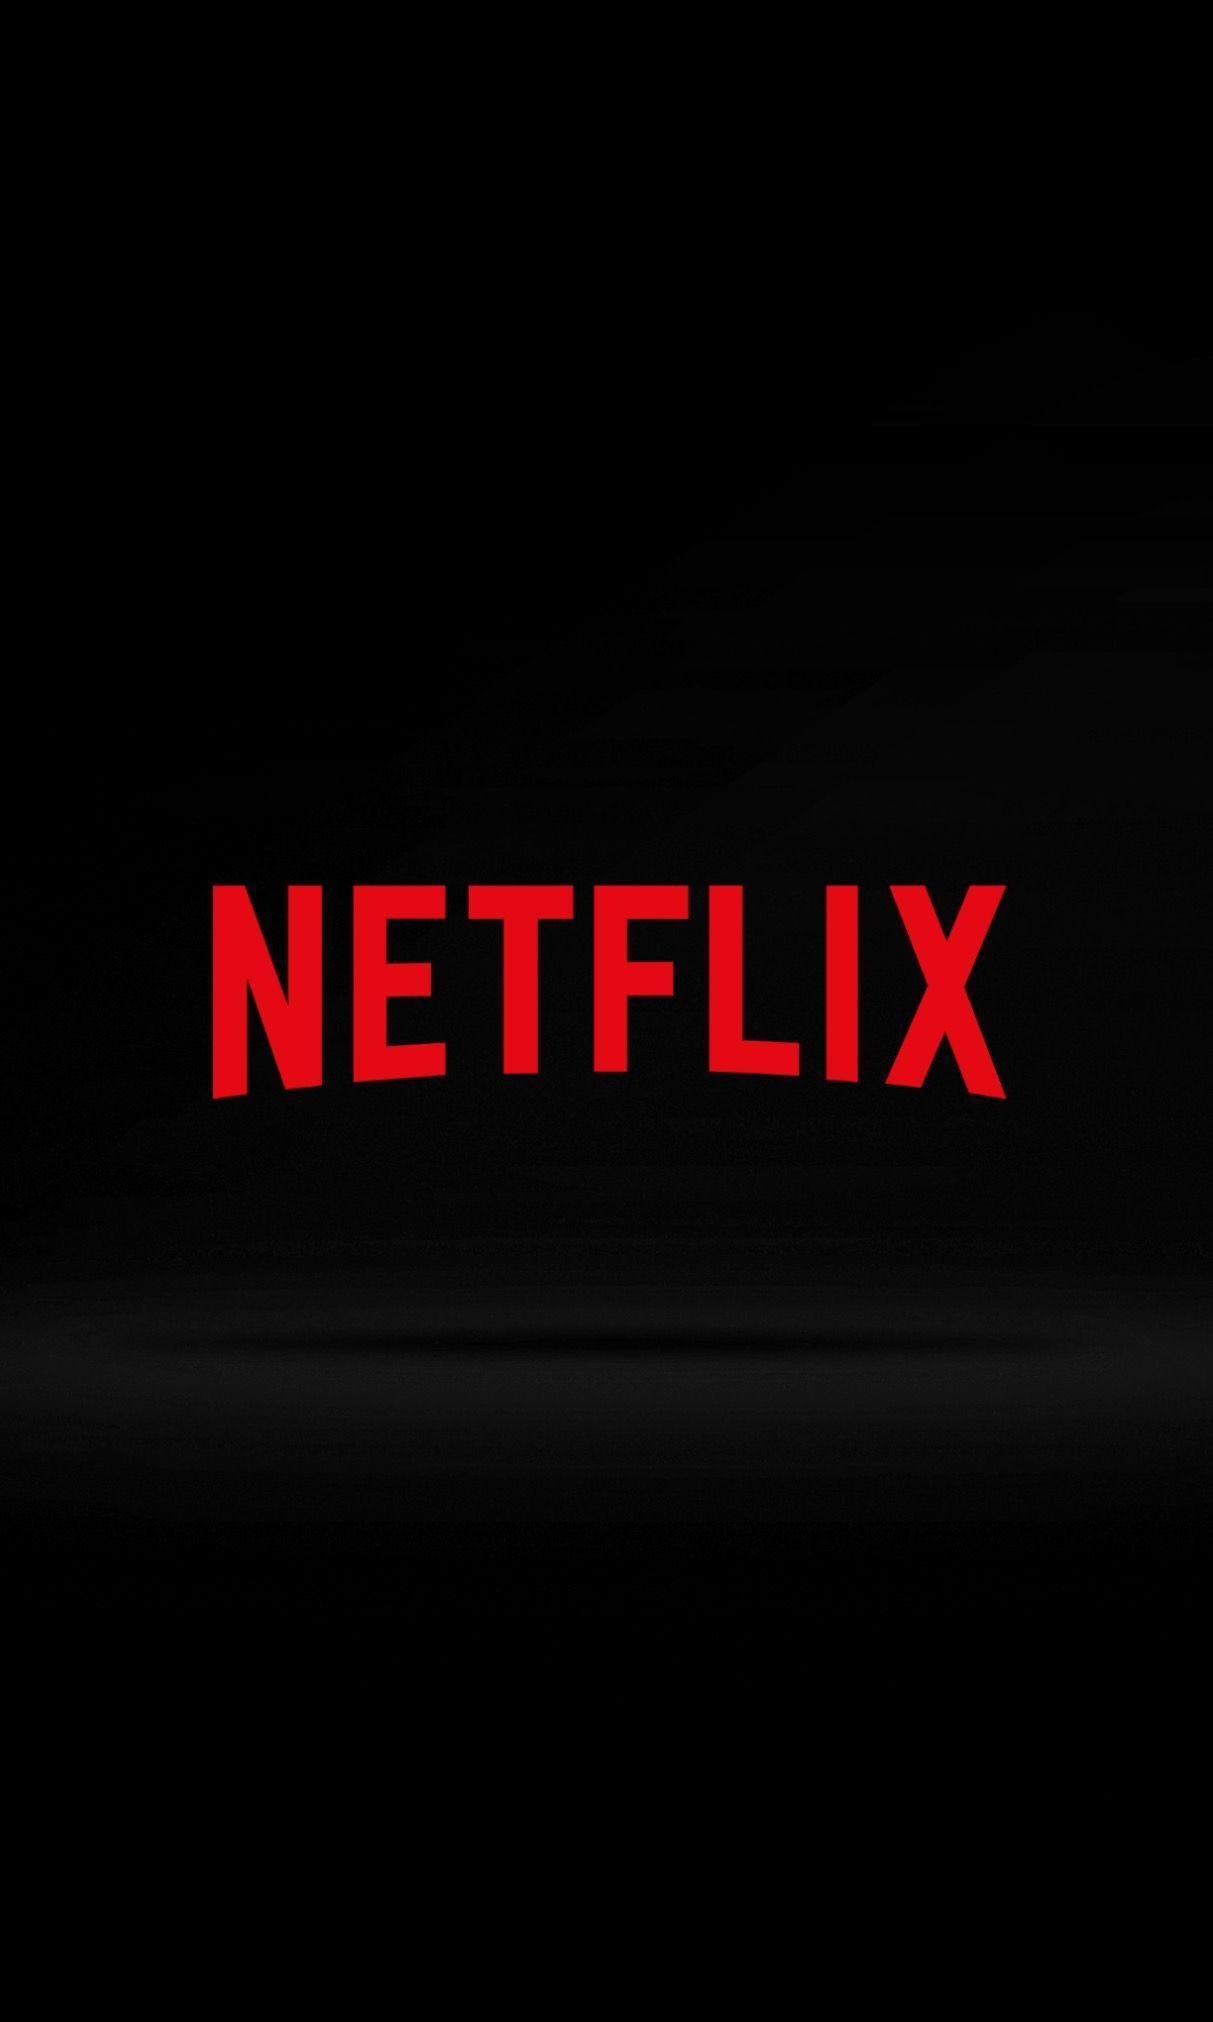 Netflix Series Wallpapers Wallpaper Cave